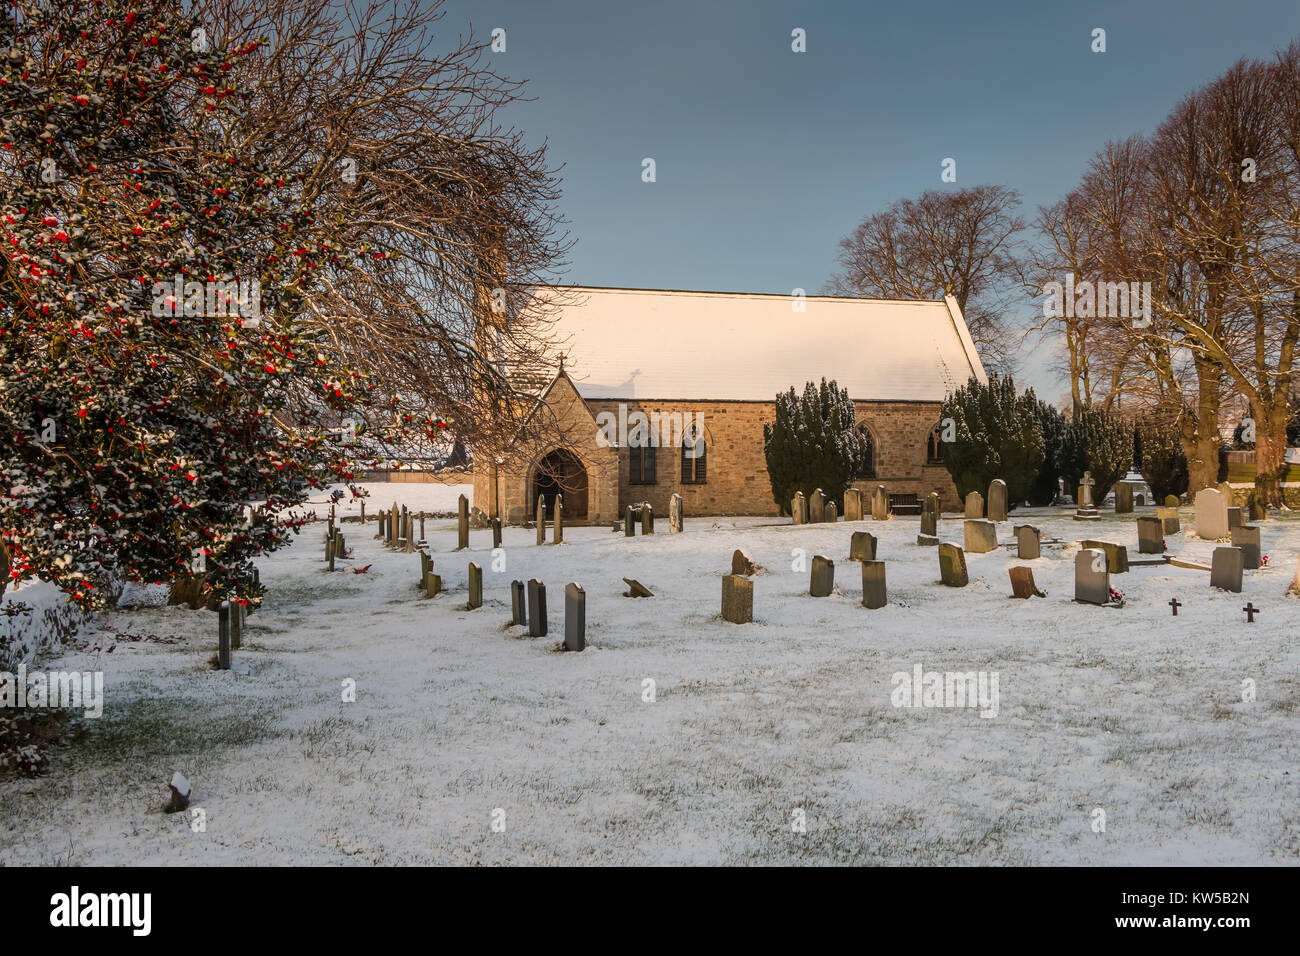 st-marys-parish-church-hutton-magna-tees